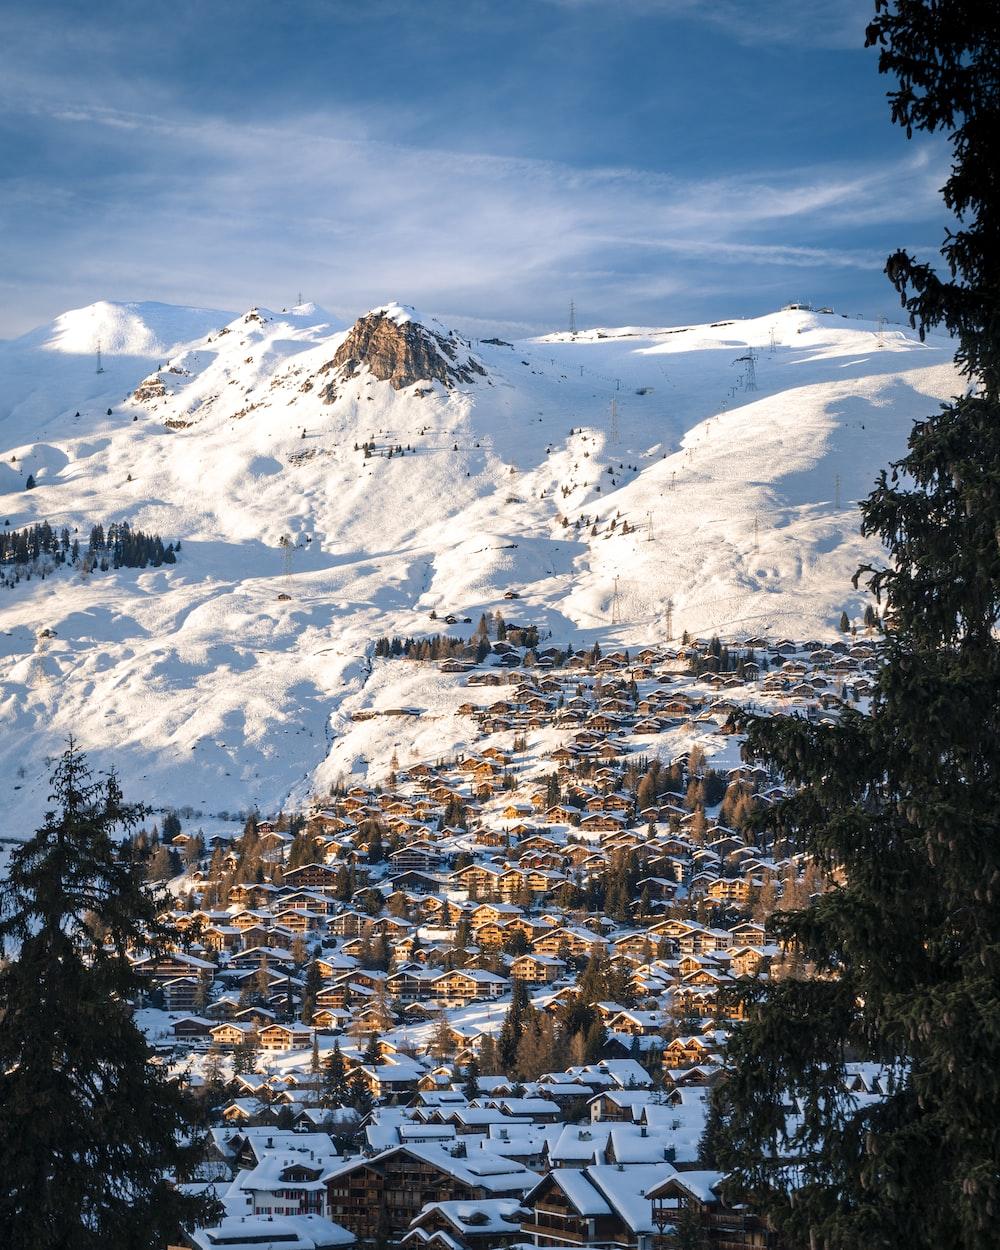 village near snow mountain